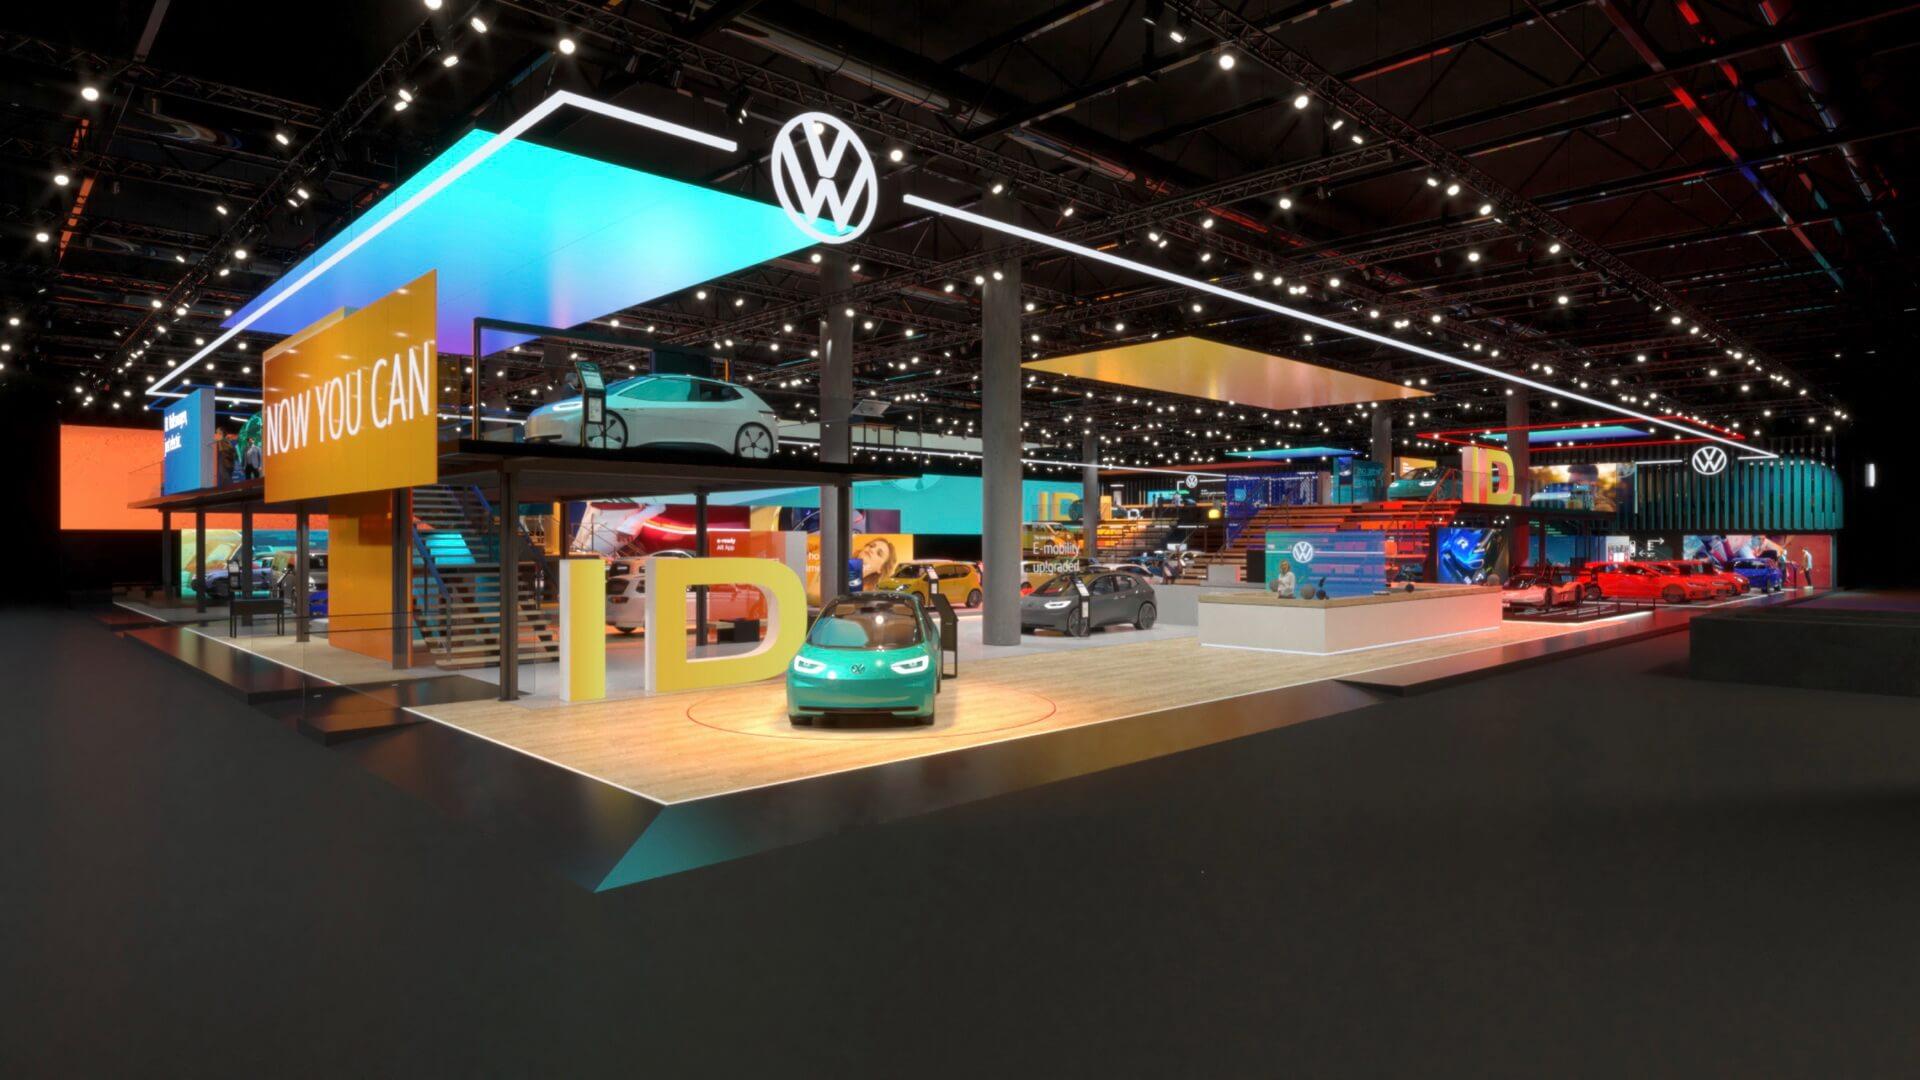 Volkswagen представил новый фирменный дизайн и логотип на автосалоне во Франкфурте 2019